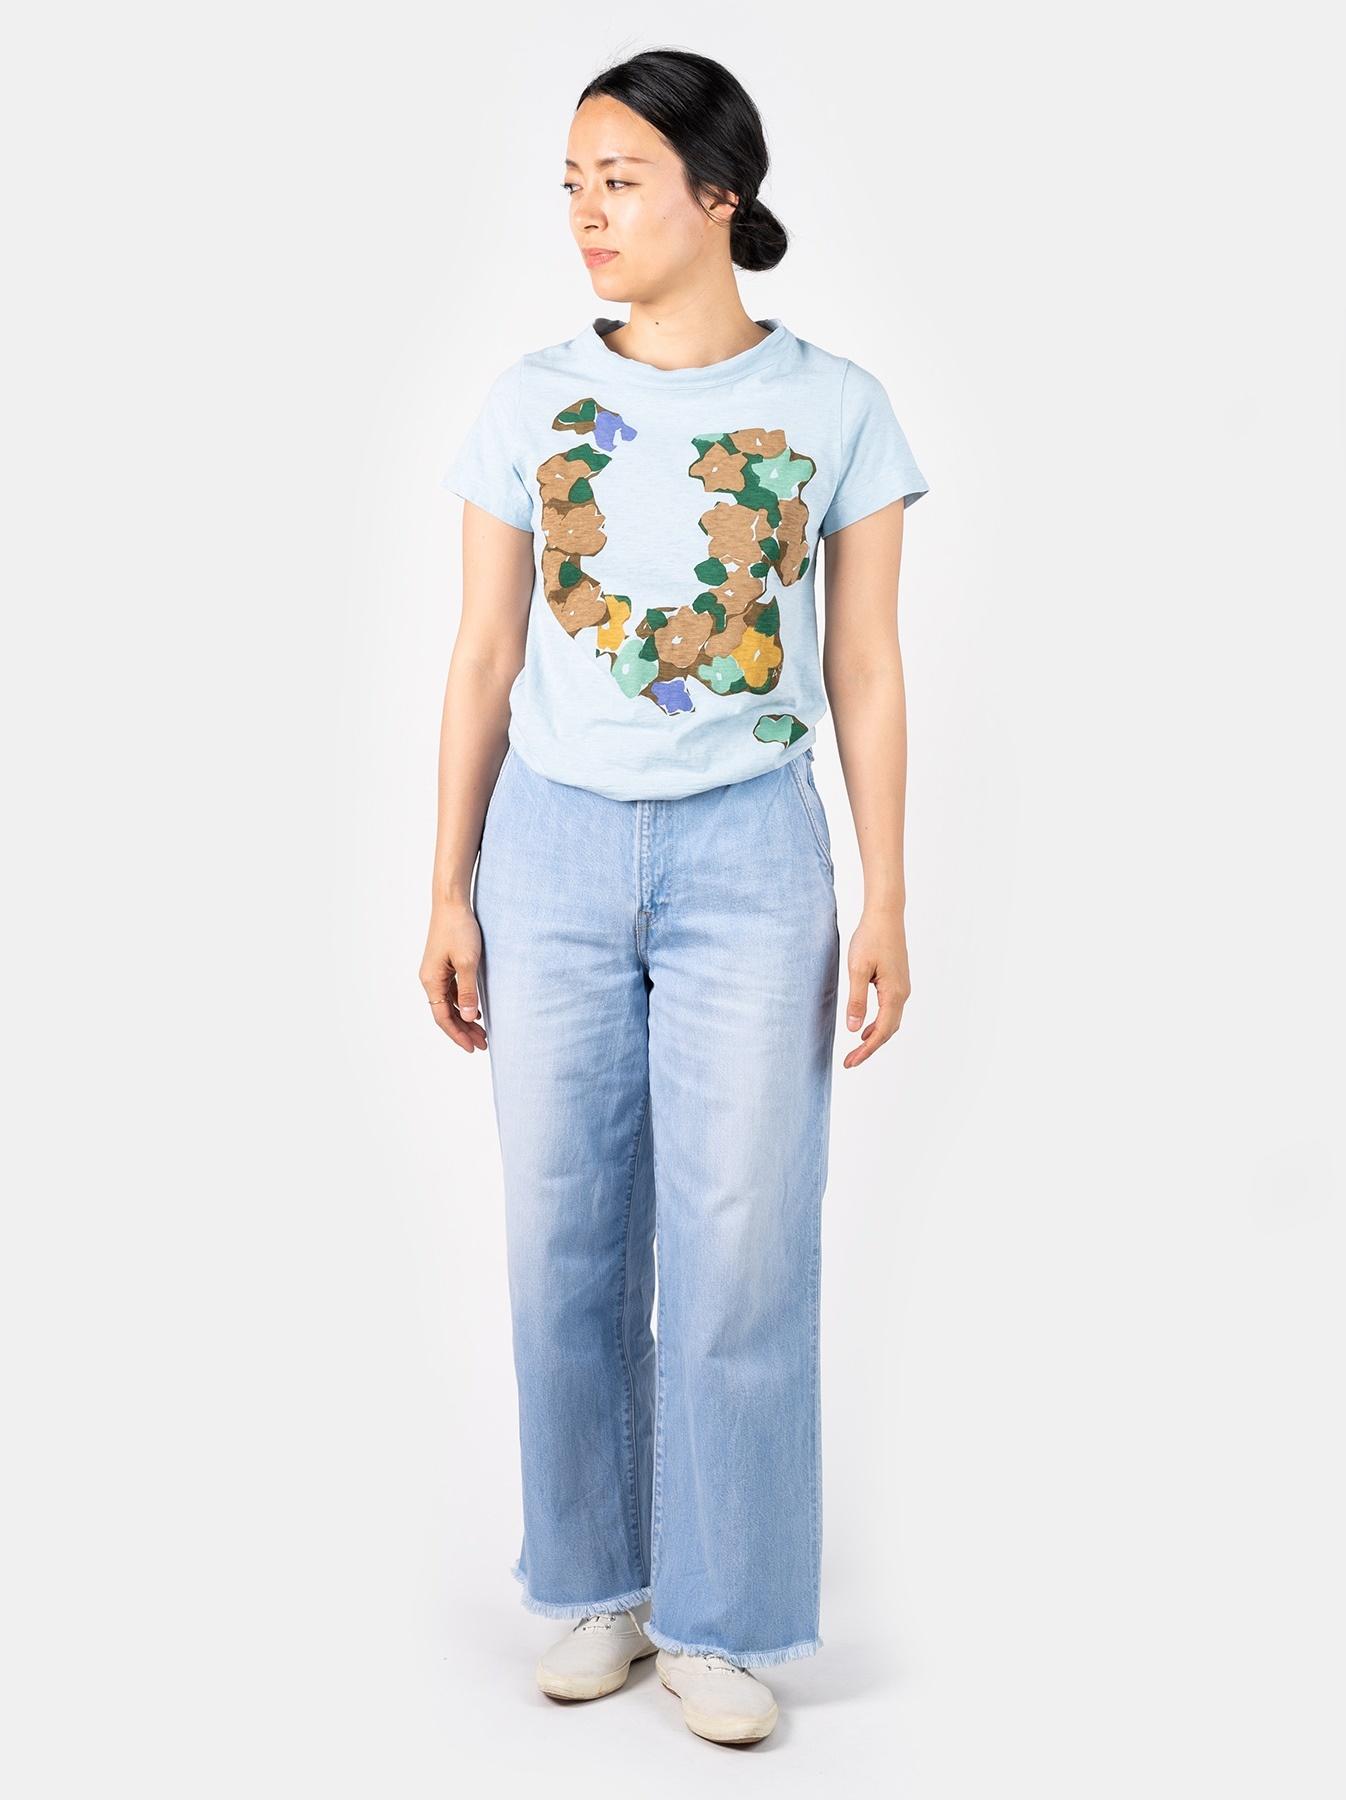 WH 45 Star T-shirt (Flower)-2